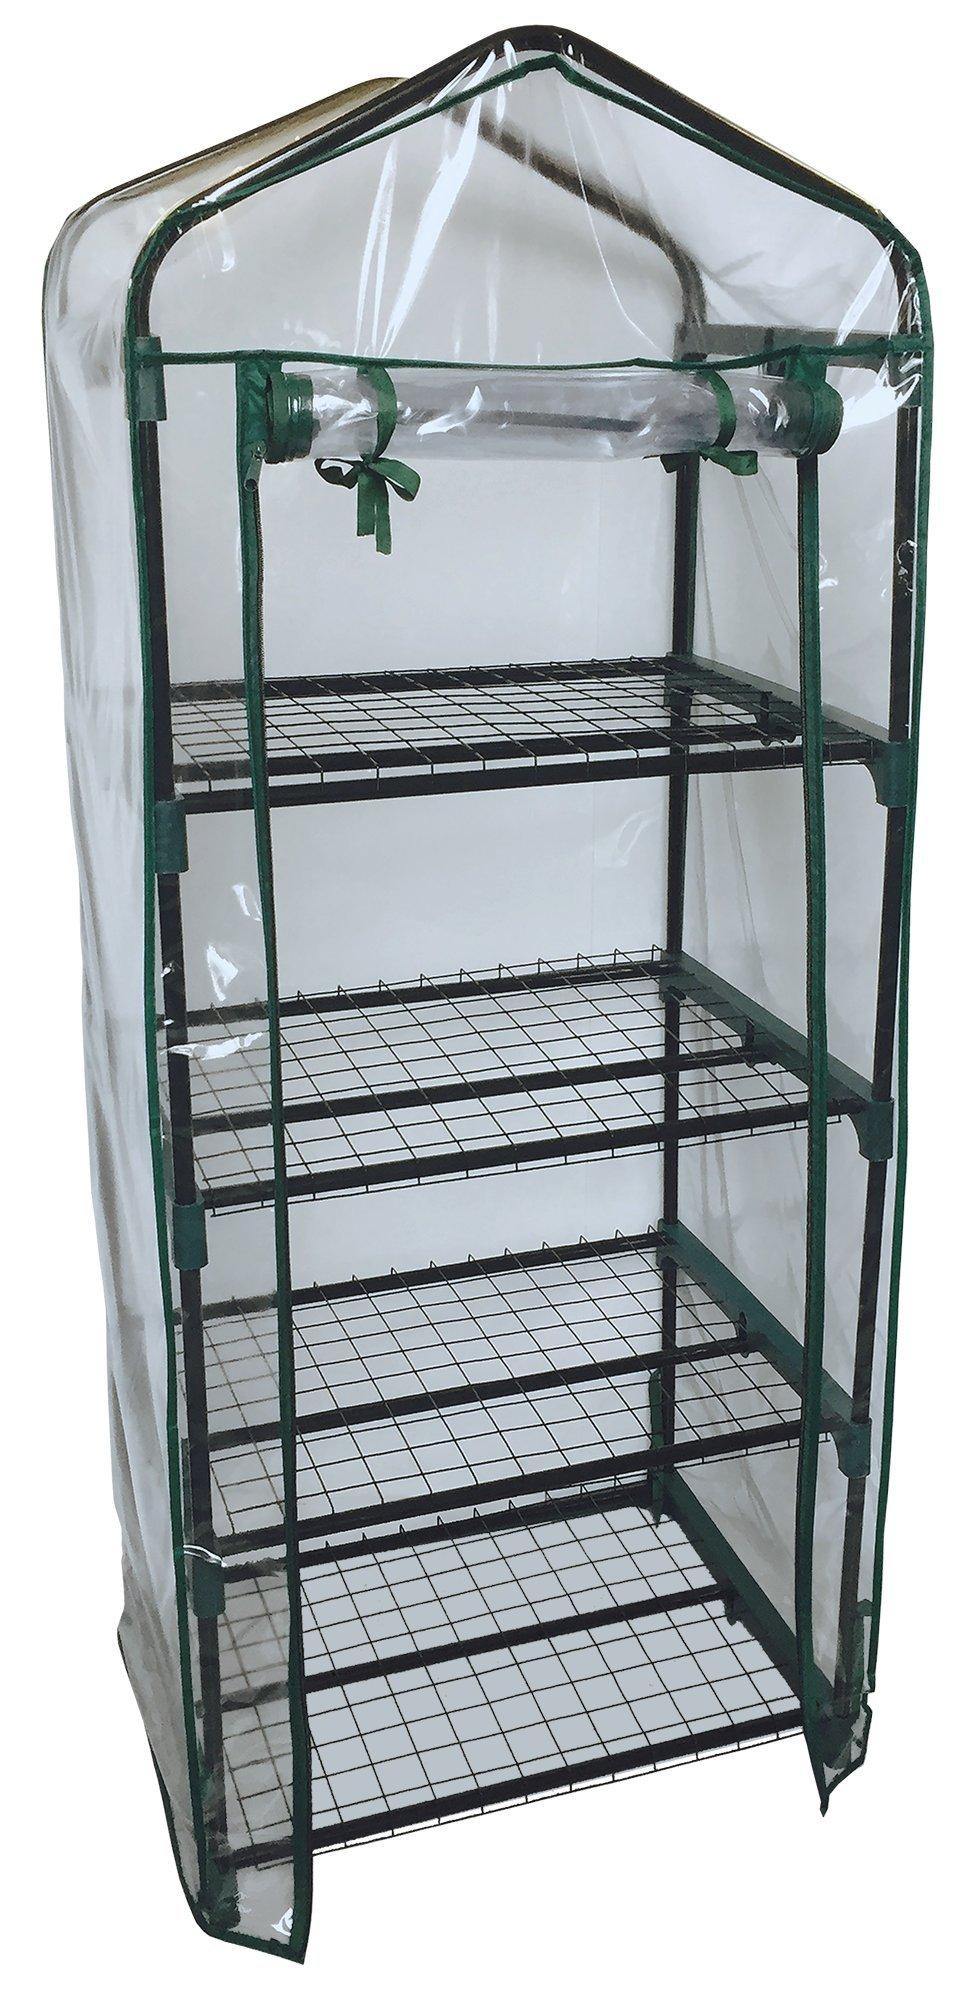 ShelterLogic GrowIT 4-Tier Mini Growhouse